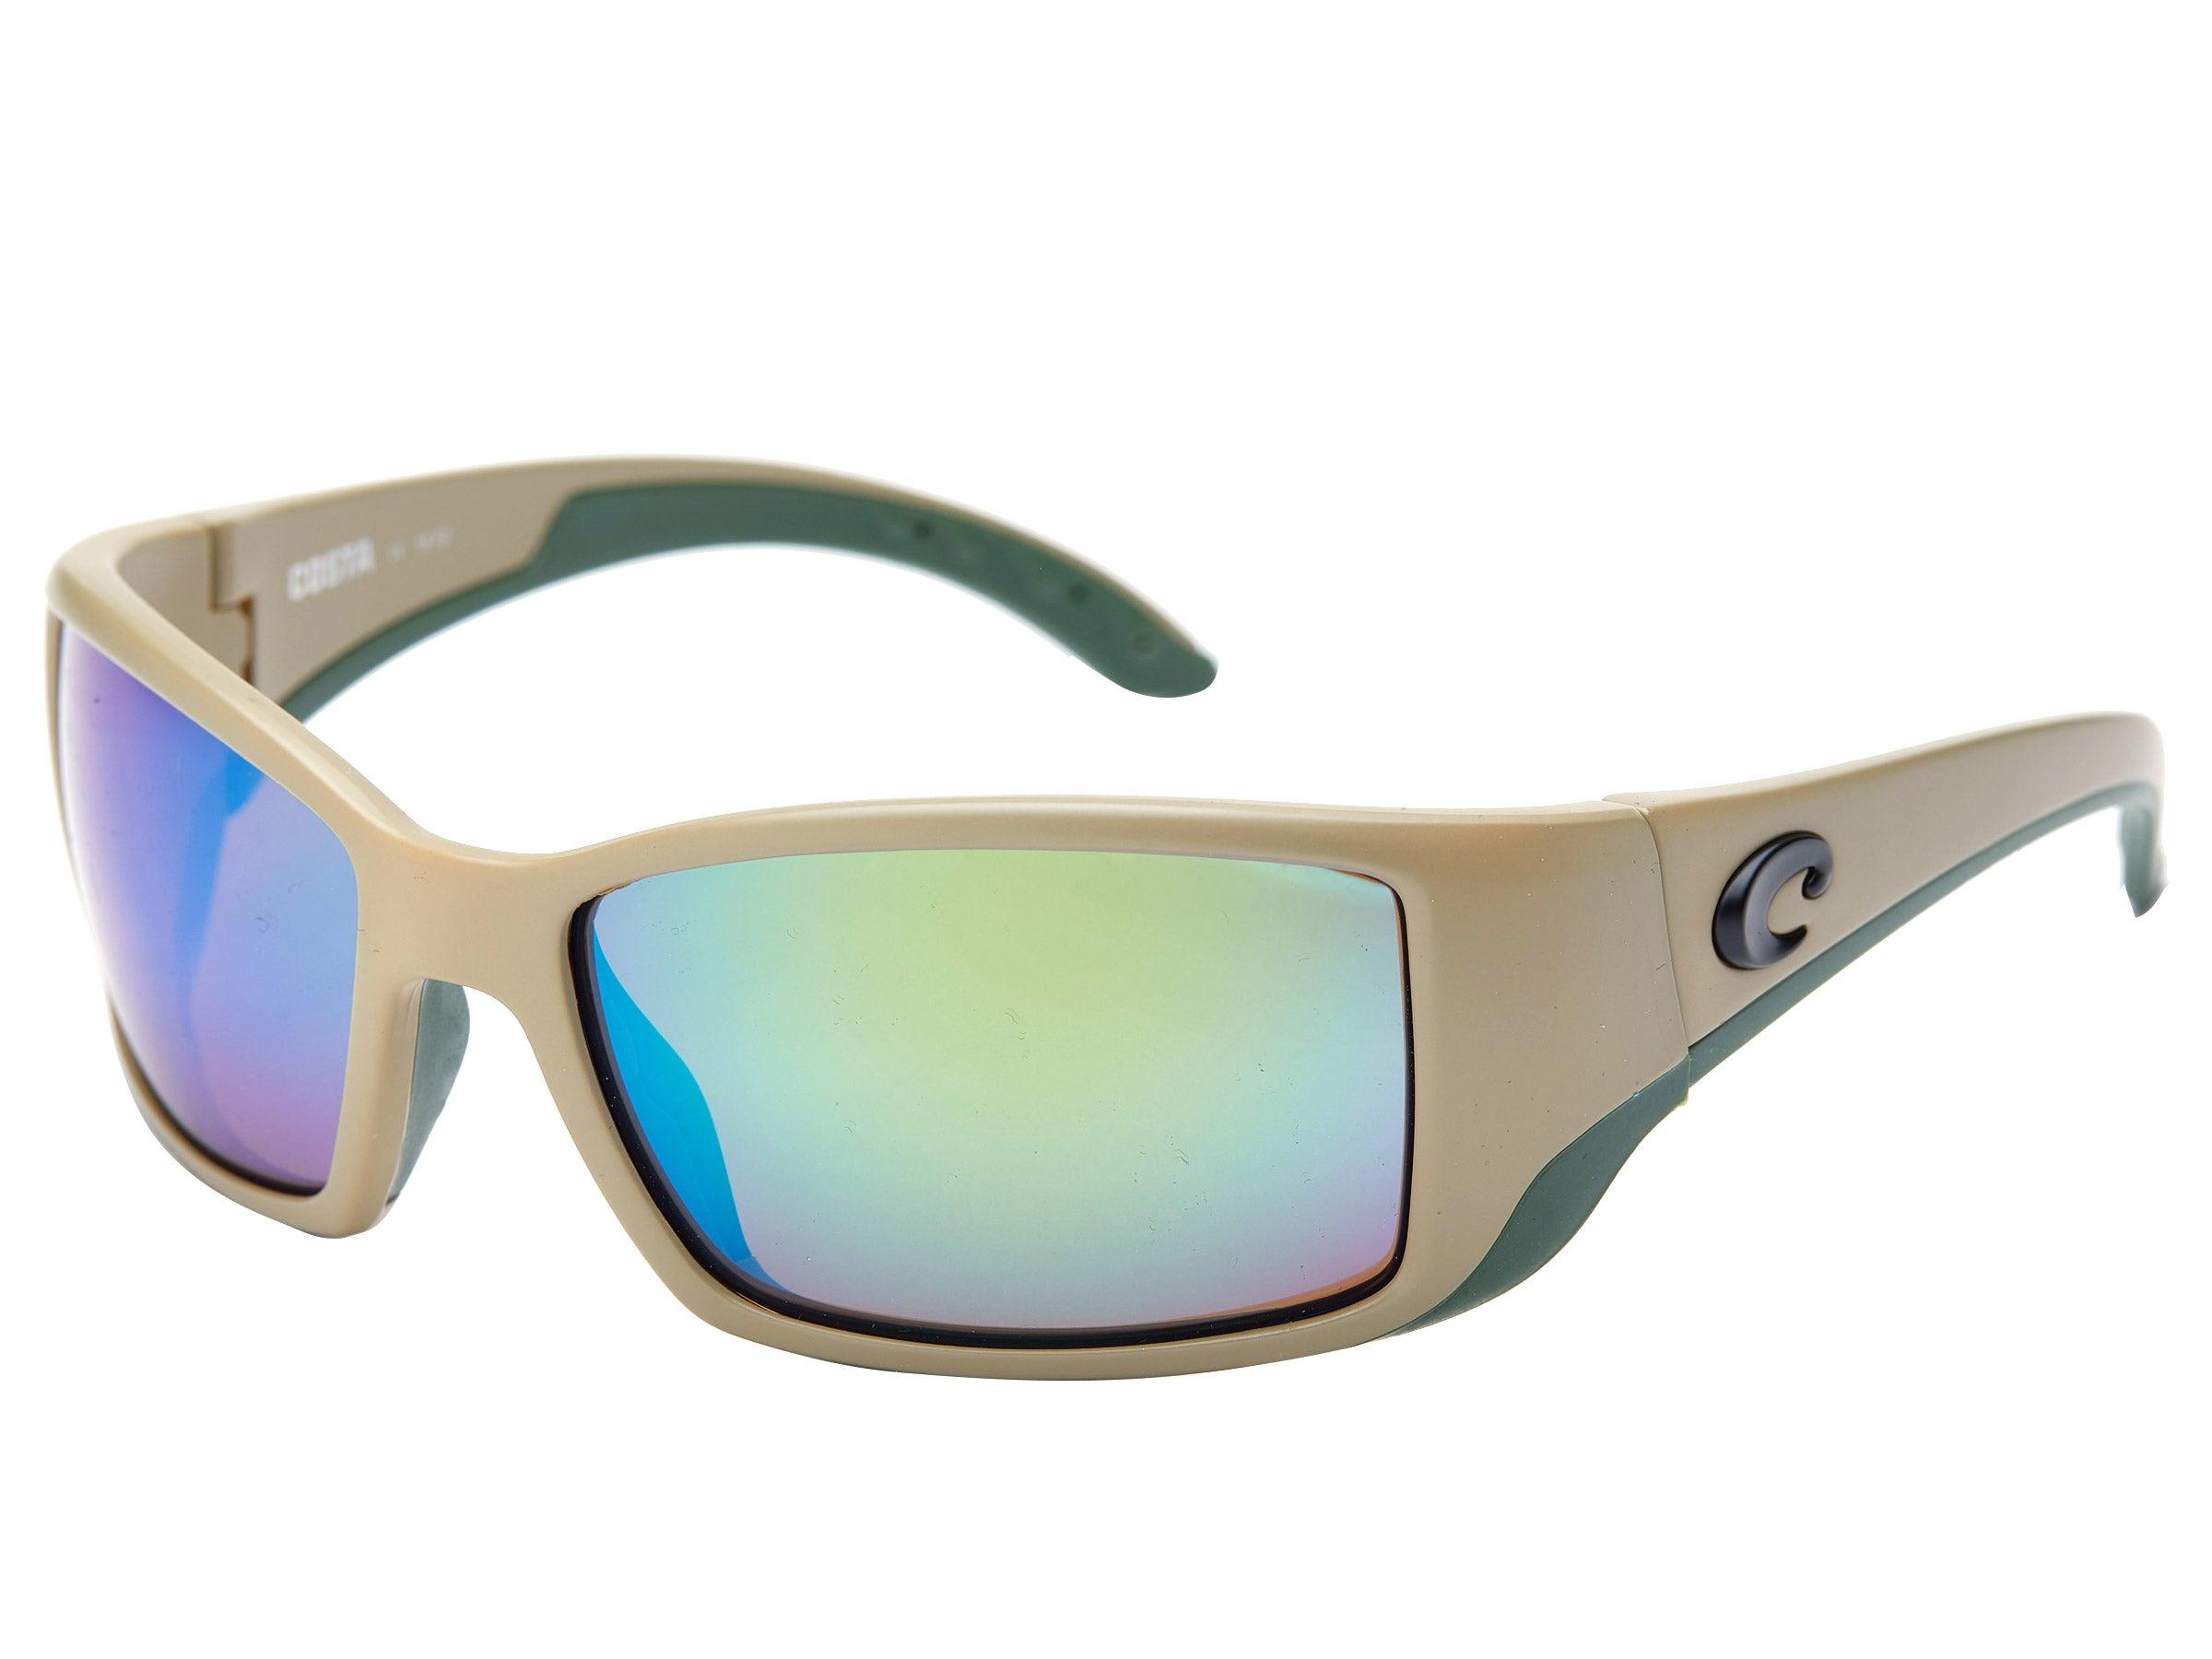 5cd0cc9ced5 Model No. BL 248 OGMGLP. Sand 580G Green Mirror